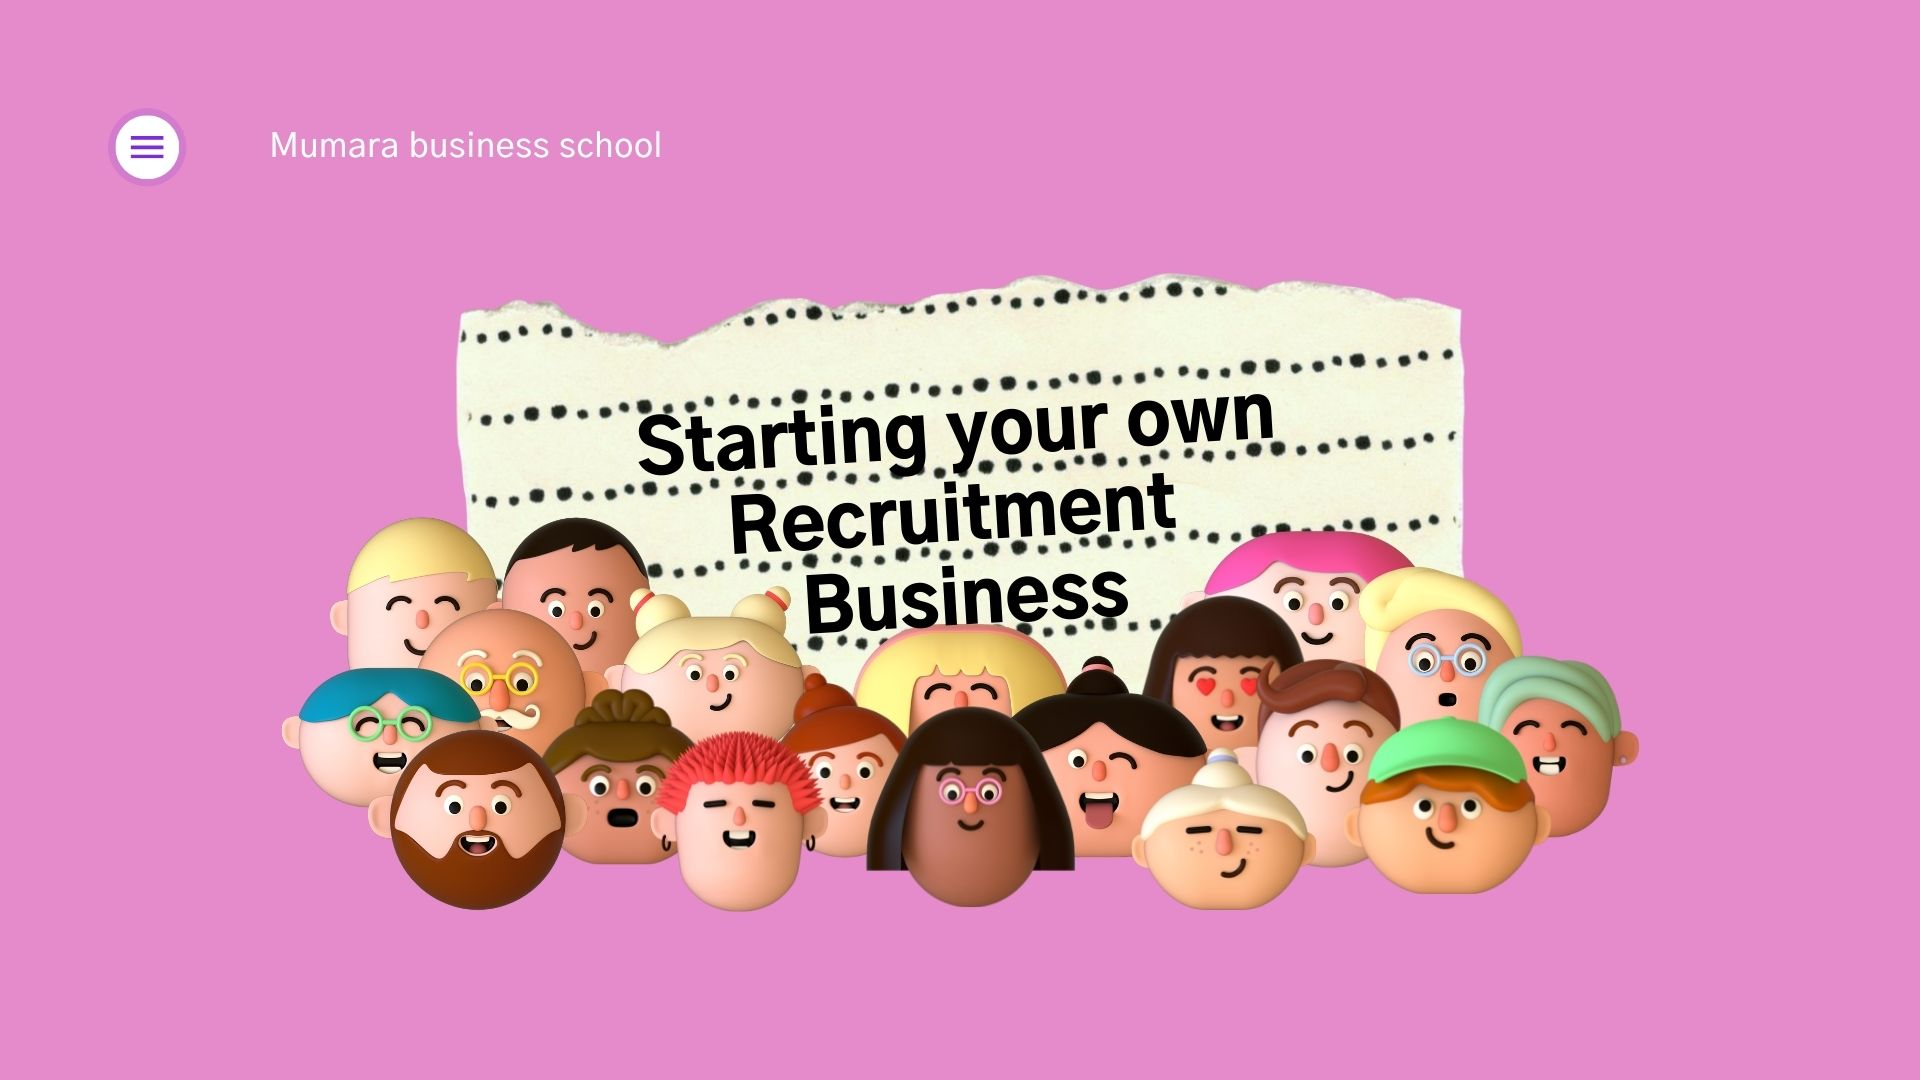 Start a Recruitment Business with Mumara one